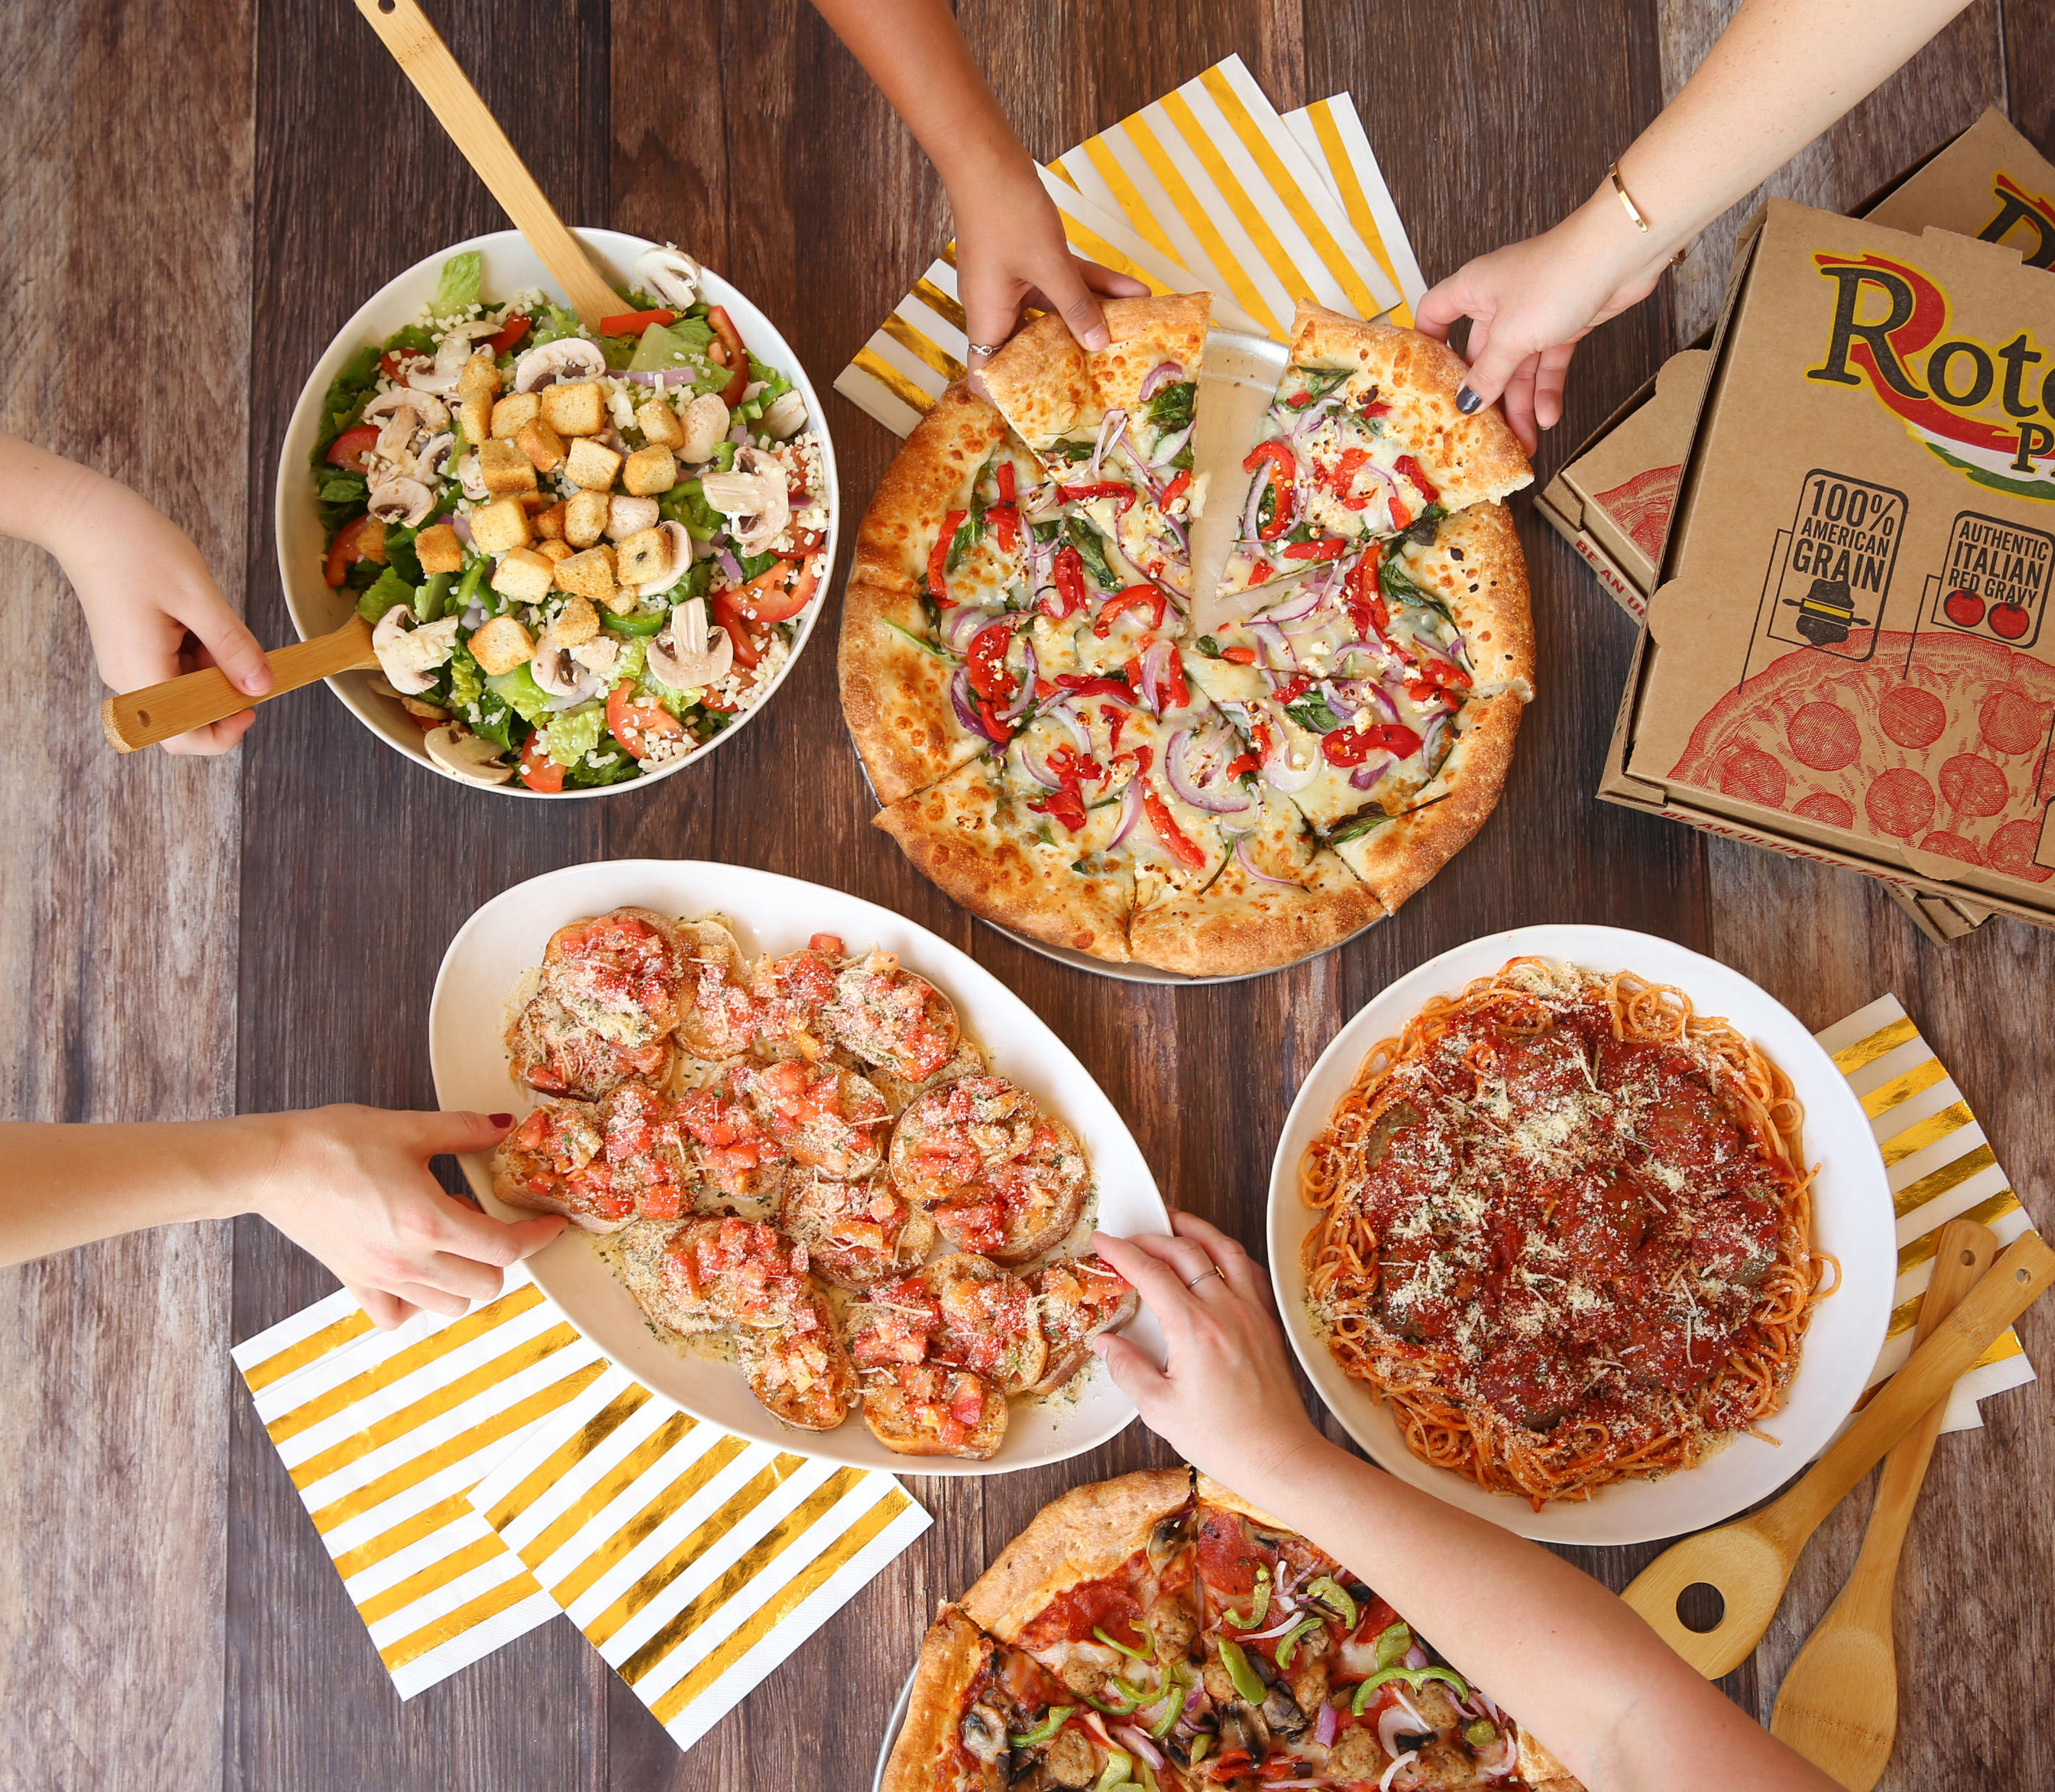 Rotolo's Pizzeria image 9